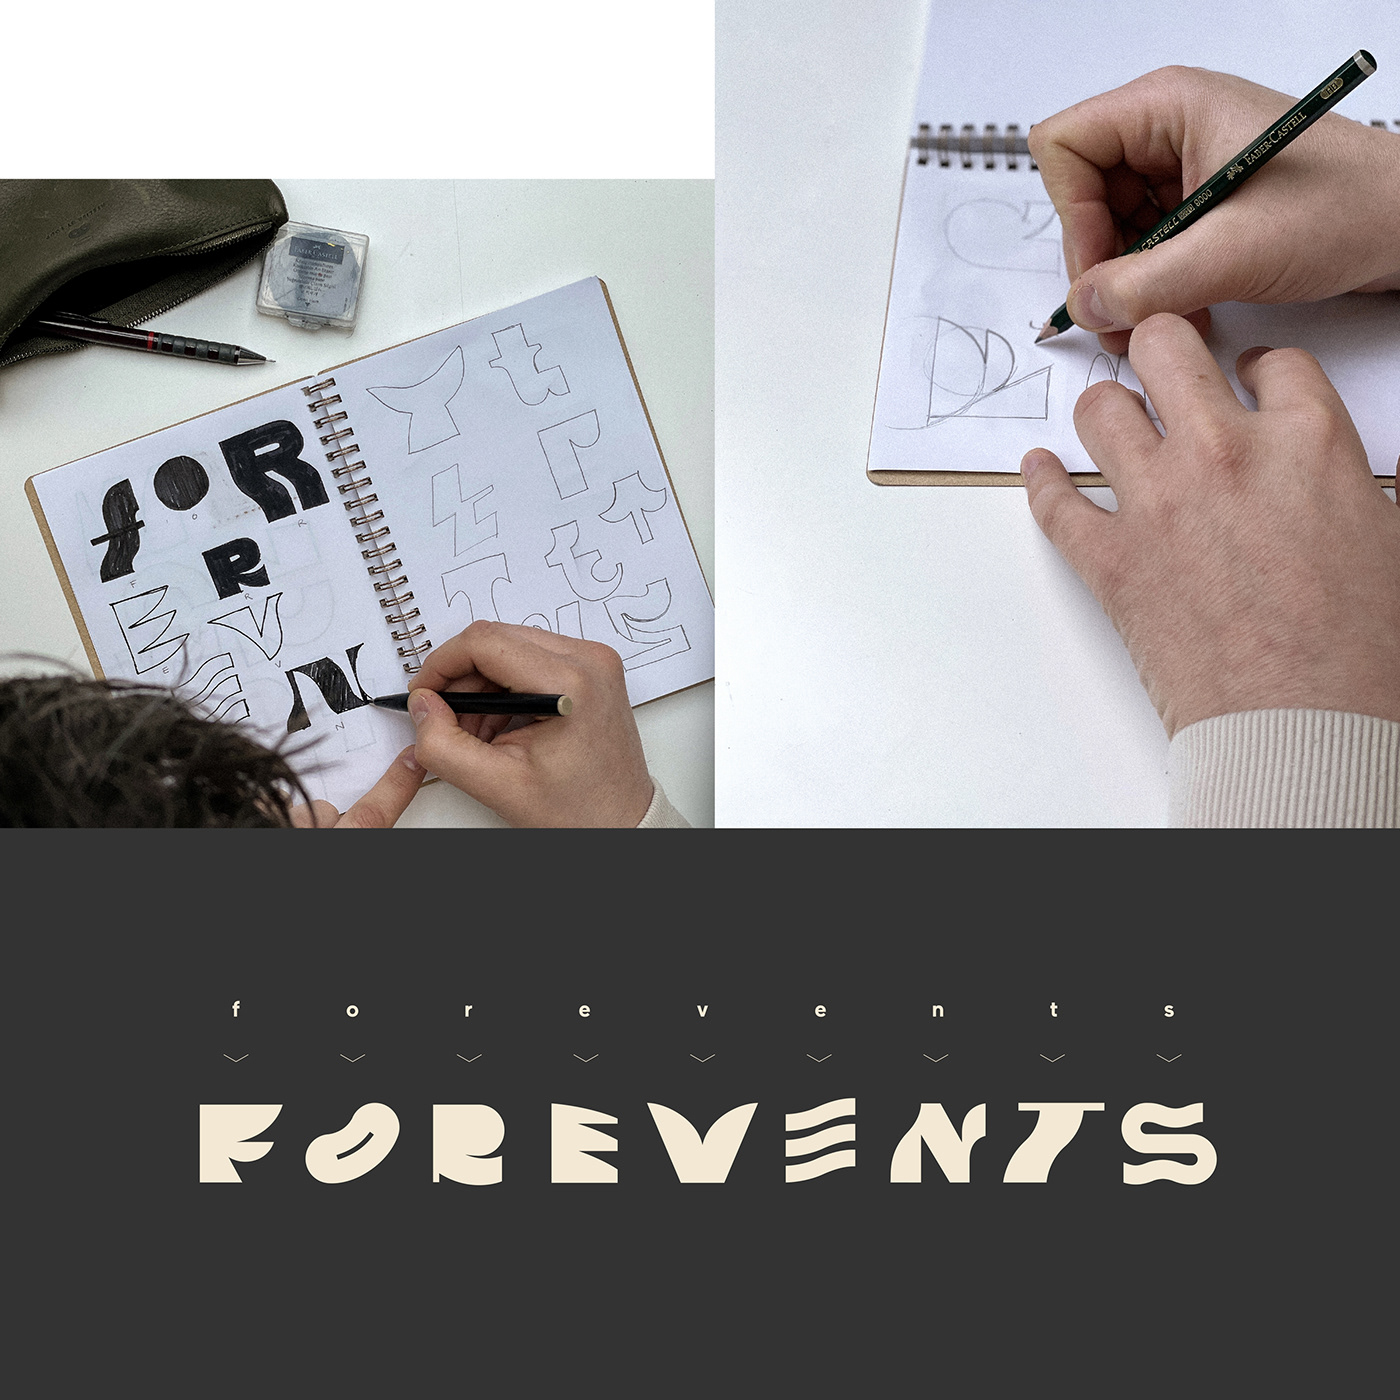 alphabet art direction  Brand Design brand identity branding  creative graphic design  identity typography   visual identity